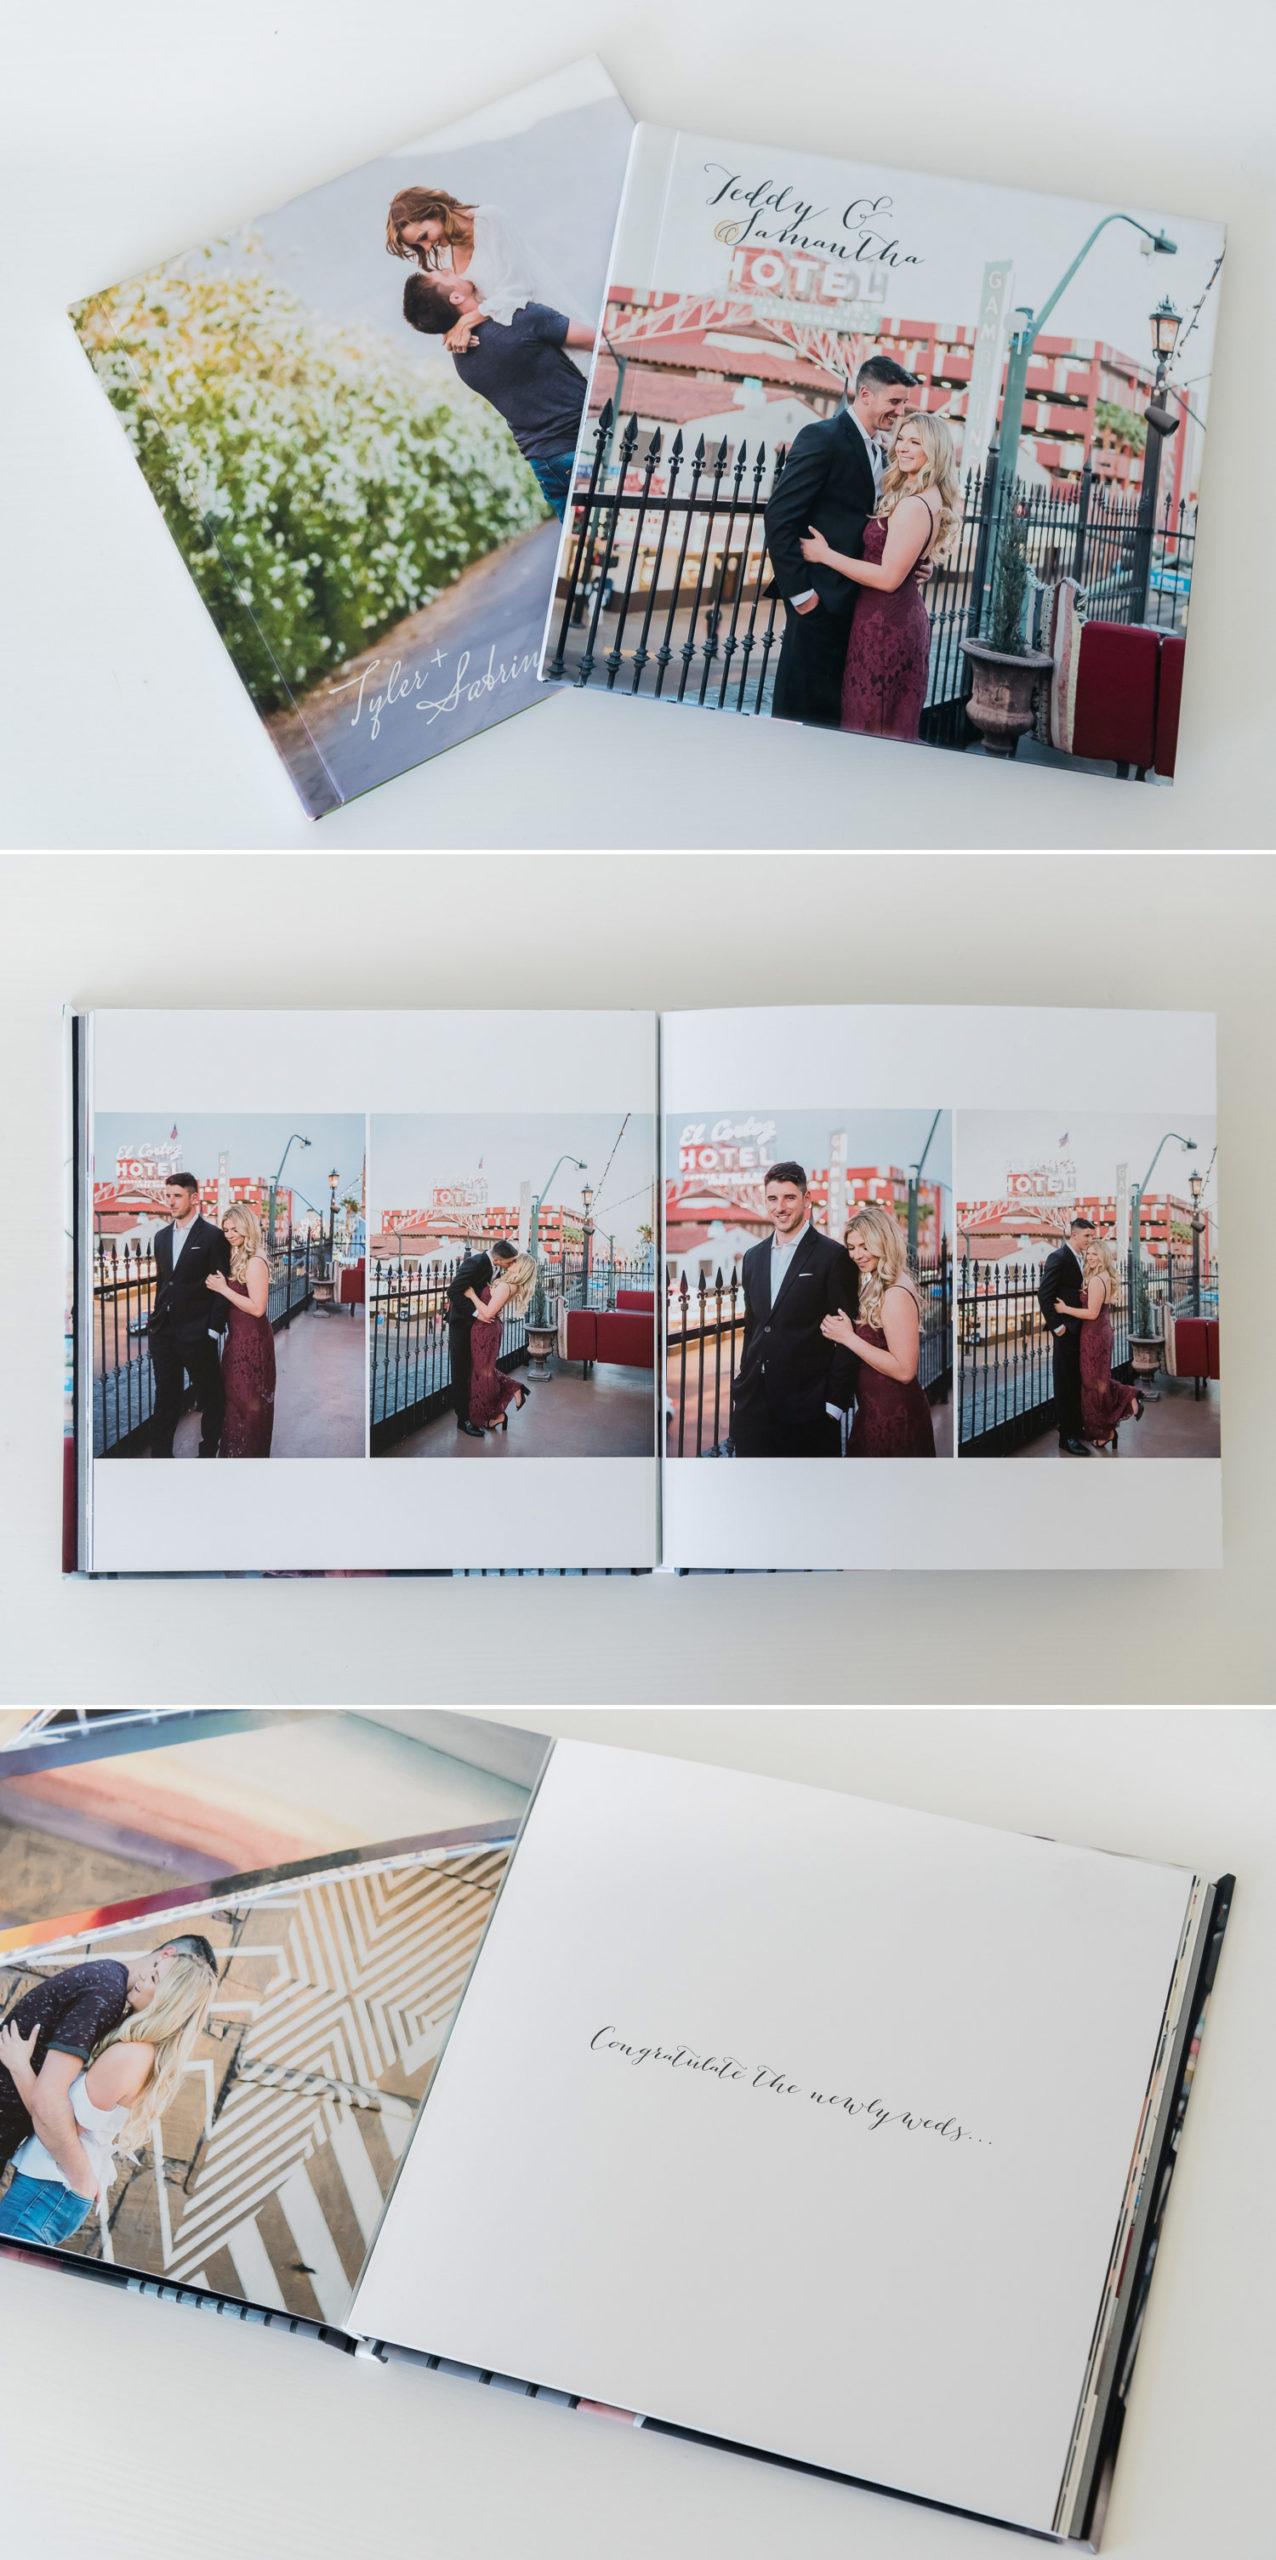 Kristen Marie Weddings + Portraits - Wedding Albums